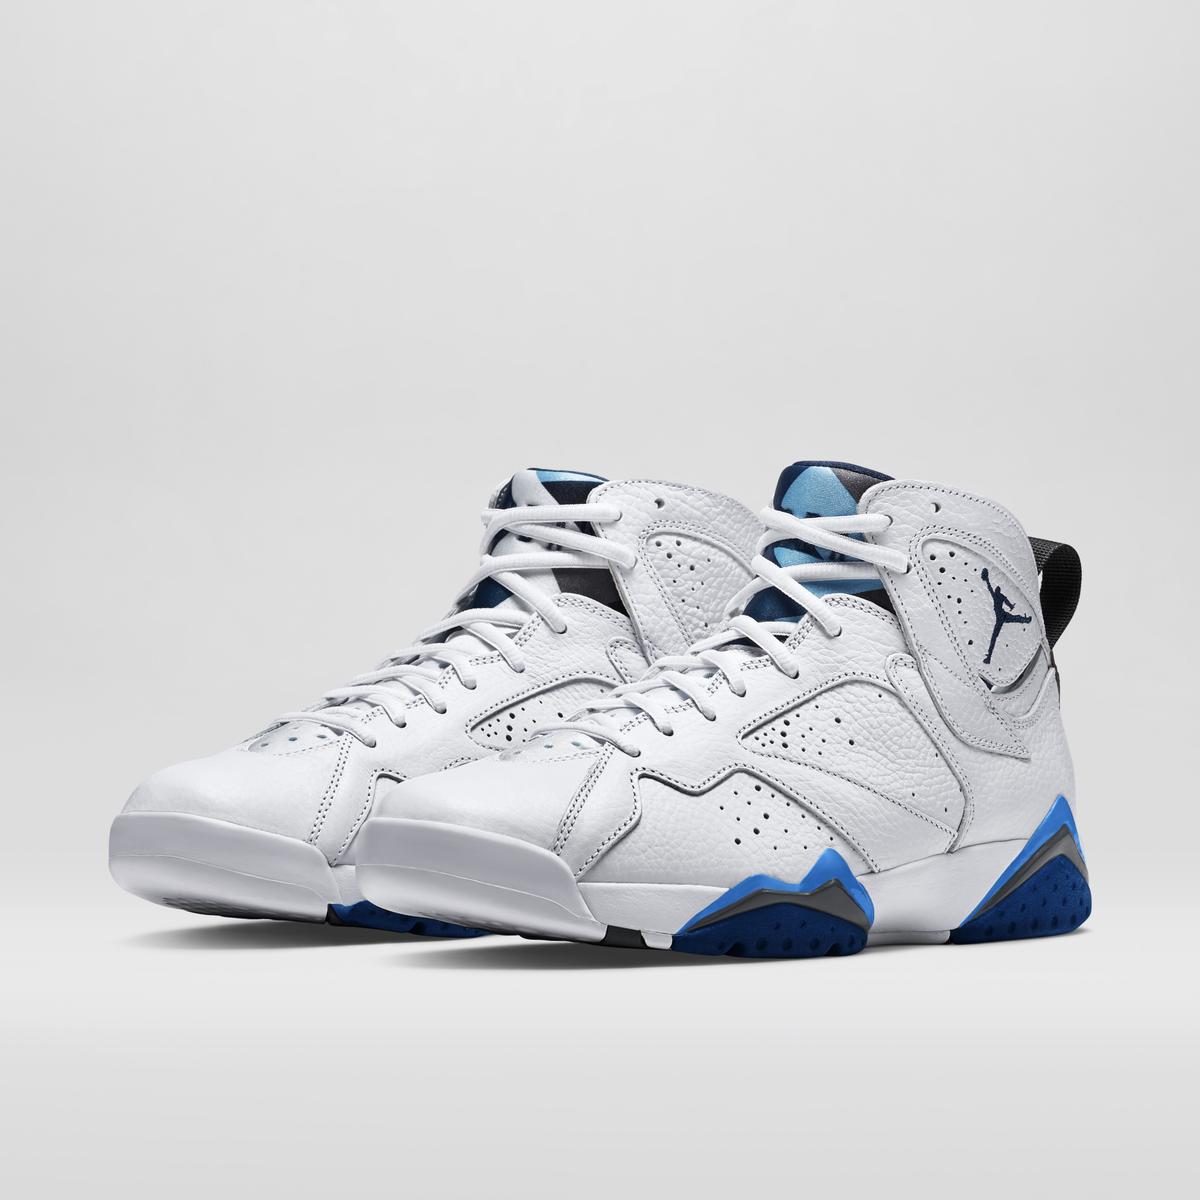 Sneakerheads! The Nike Air Jordan Retro